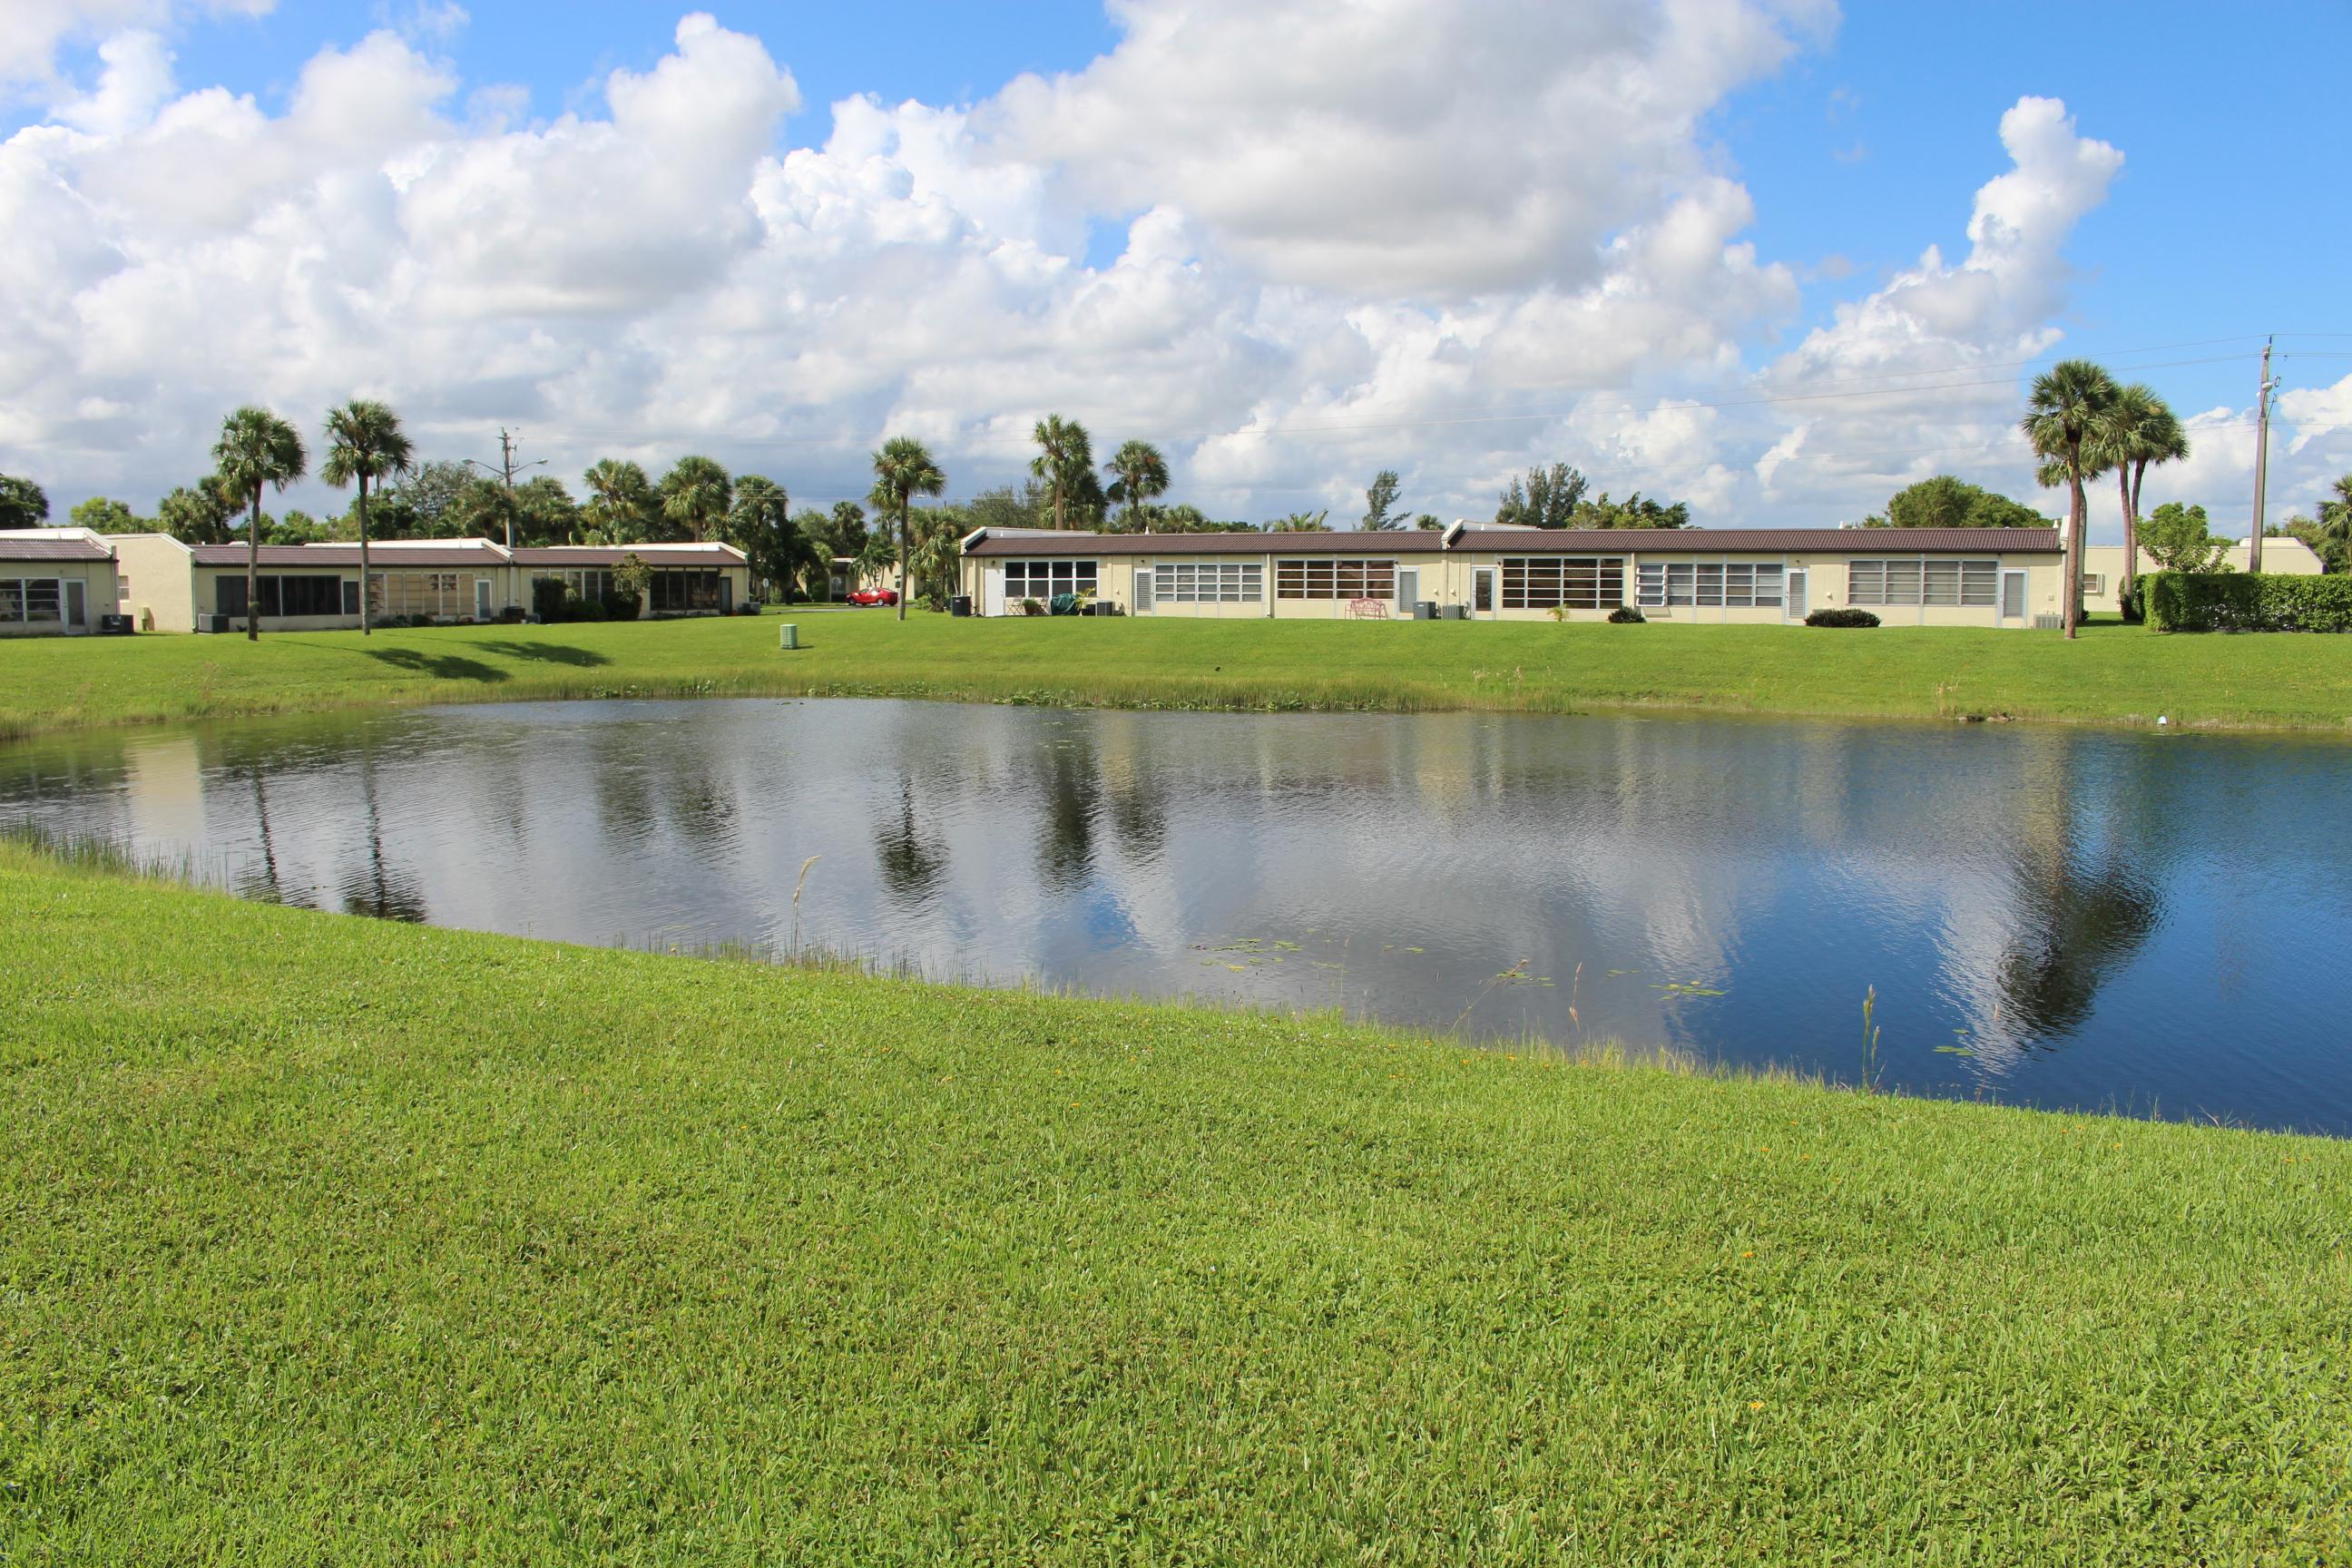 219 Lake Meryl Dr., West Palm Beach, FL 33411